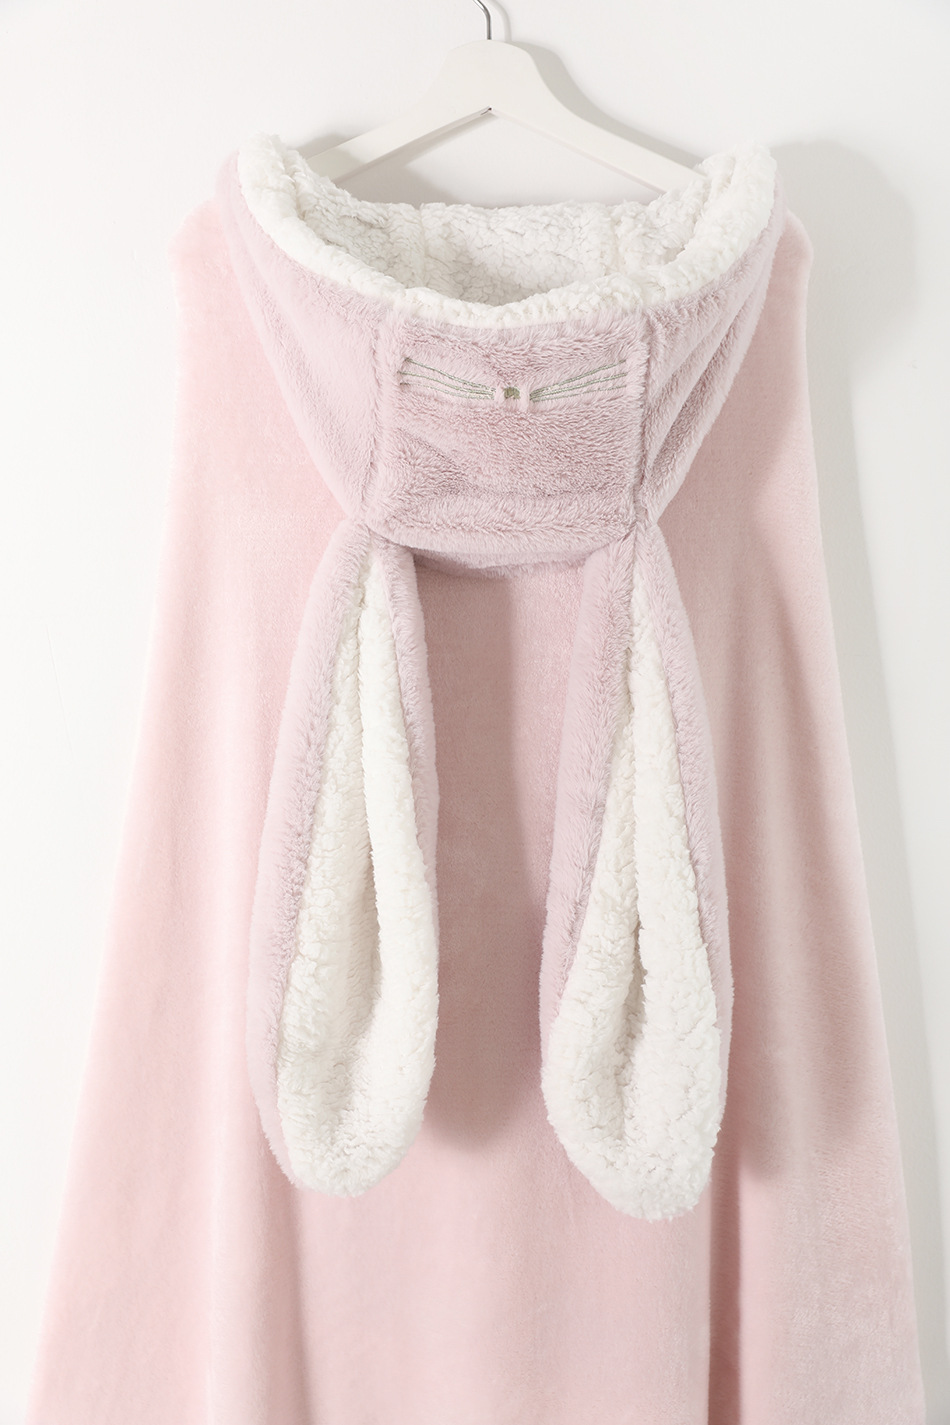 Cute Pink Comfy Blanket Sweatshirt Winter Warm Adults and Children Rabbit Ear Hooded Fleece Blanket Sleepwear Huge Bed Blankets 157